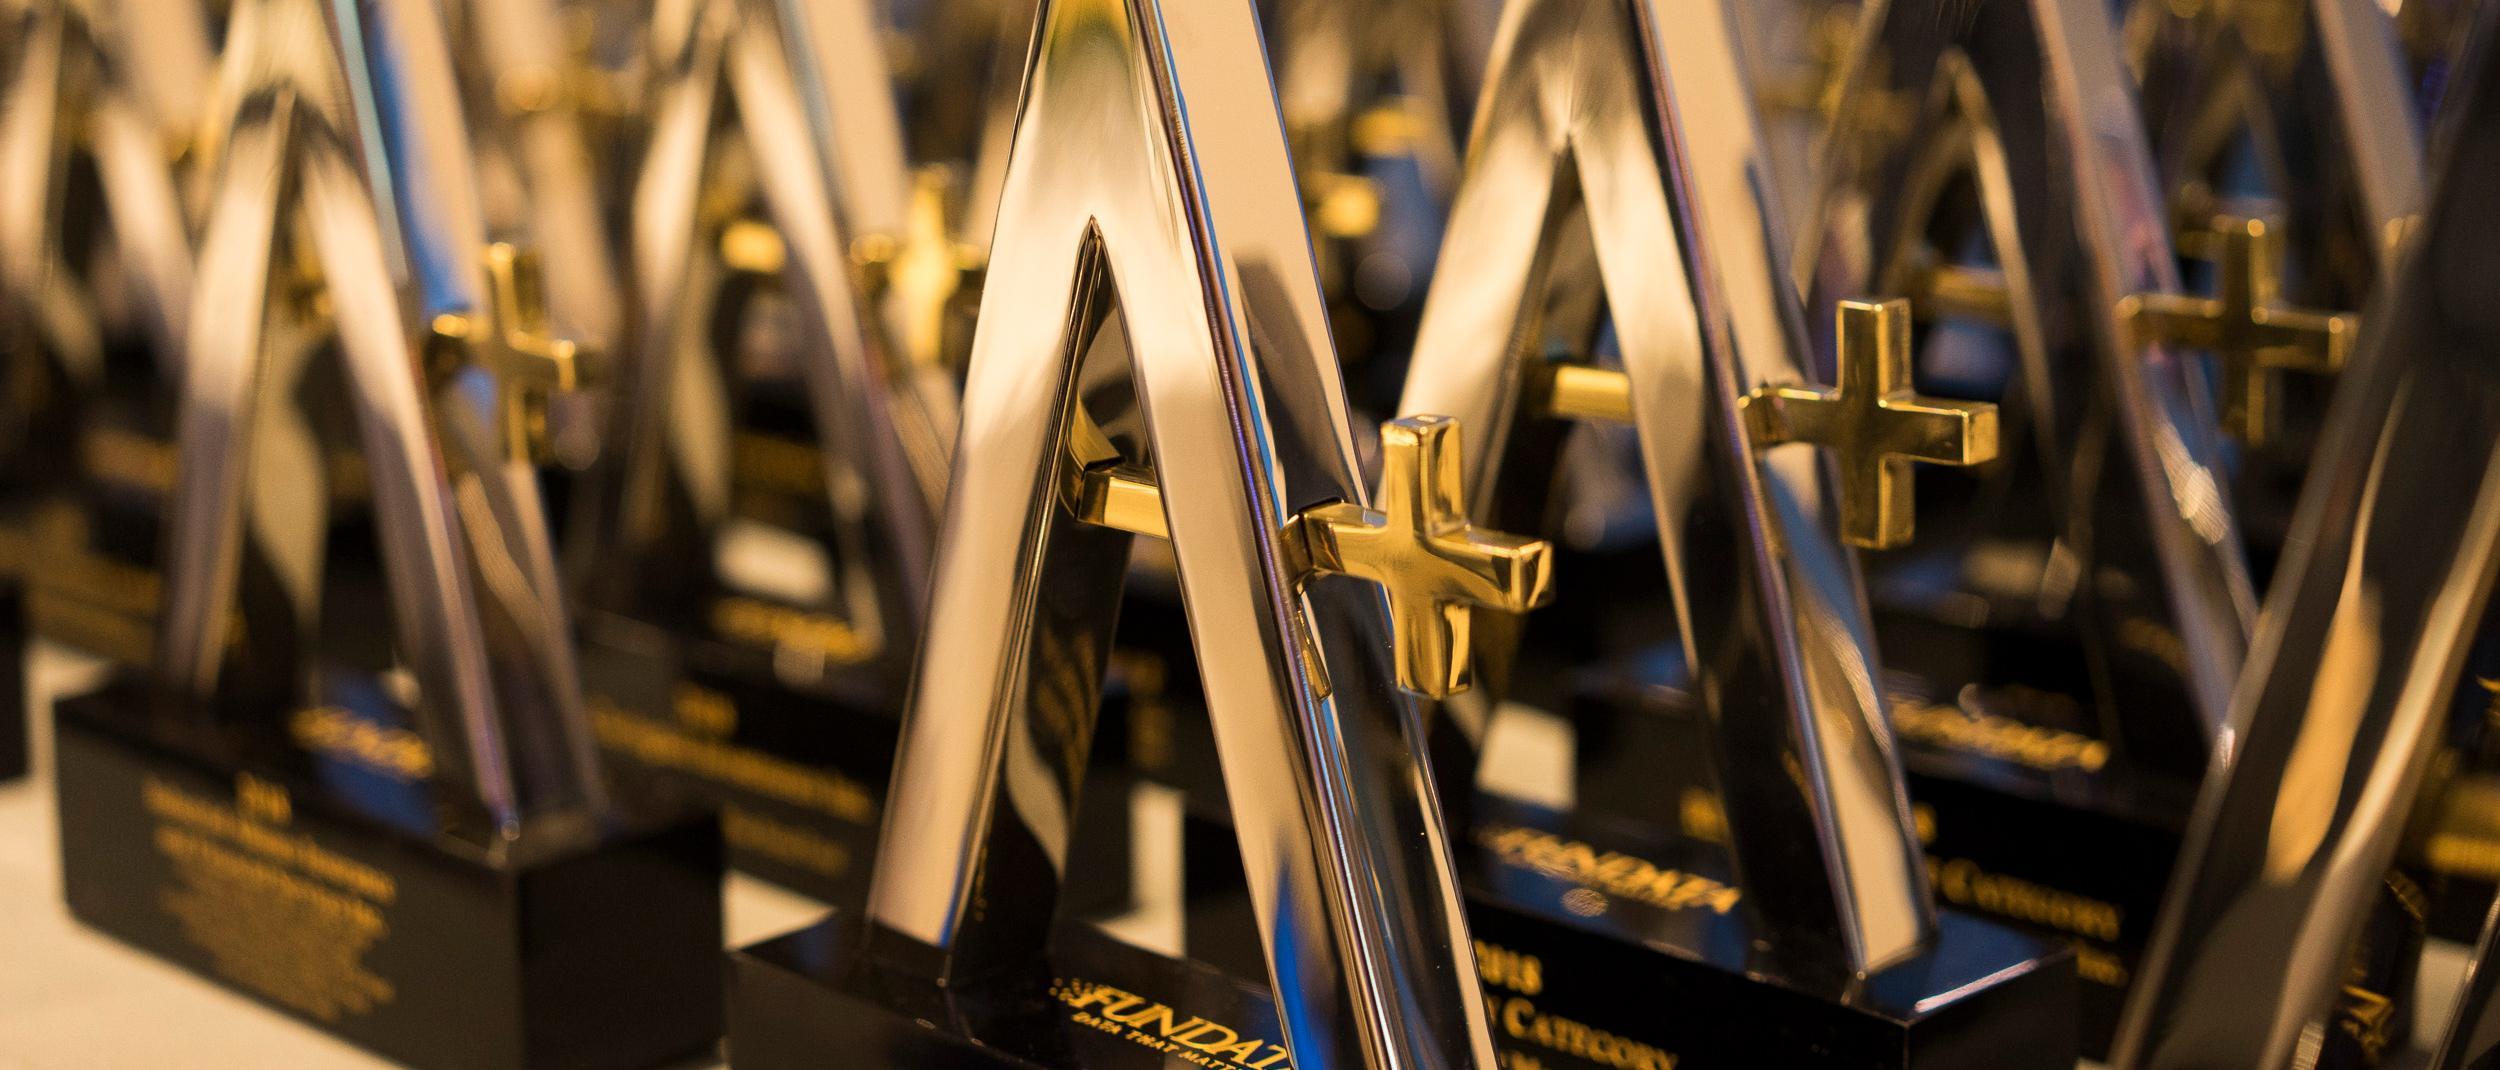 Award-winning performance: Manulife Investment Management among top honourees from Fundata Canada Thumbnail